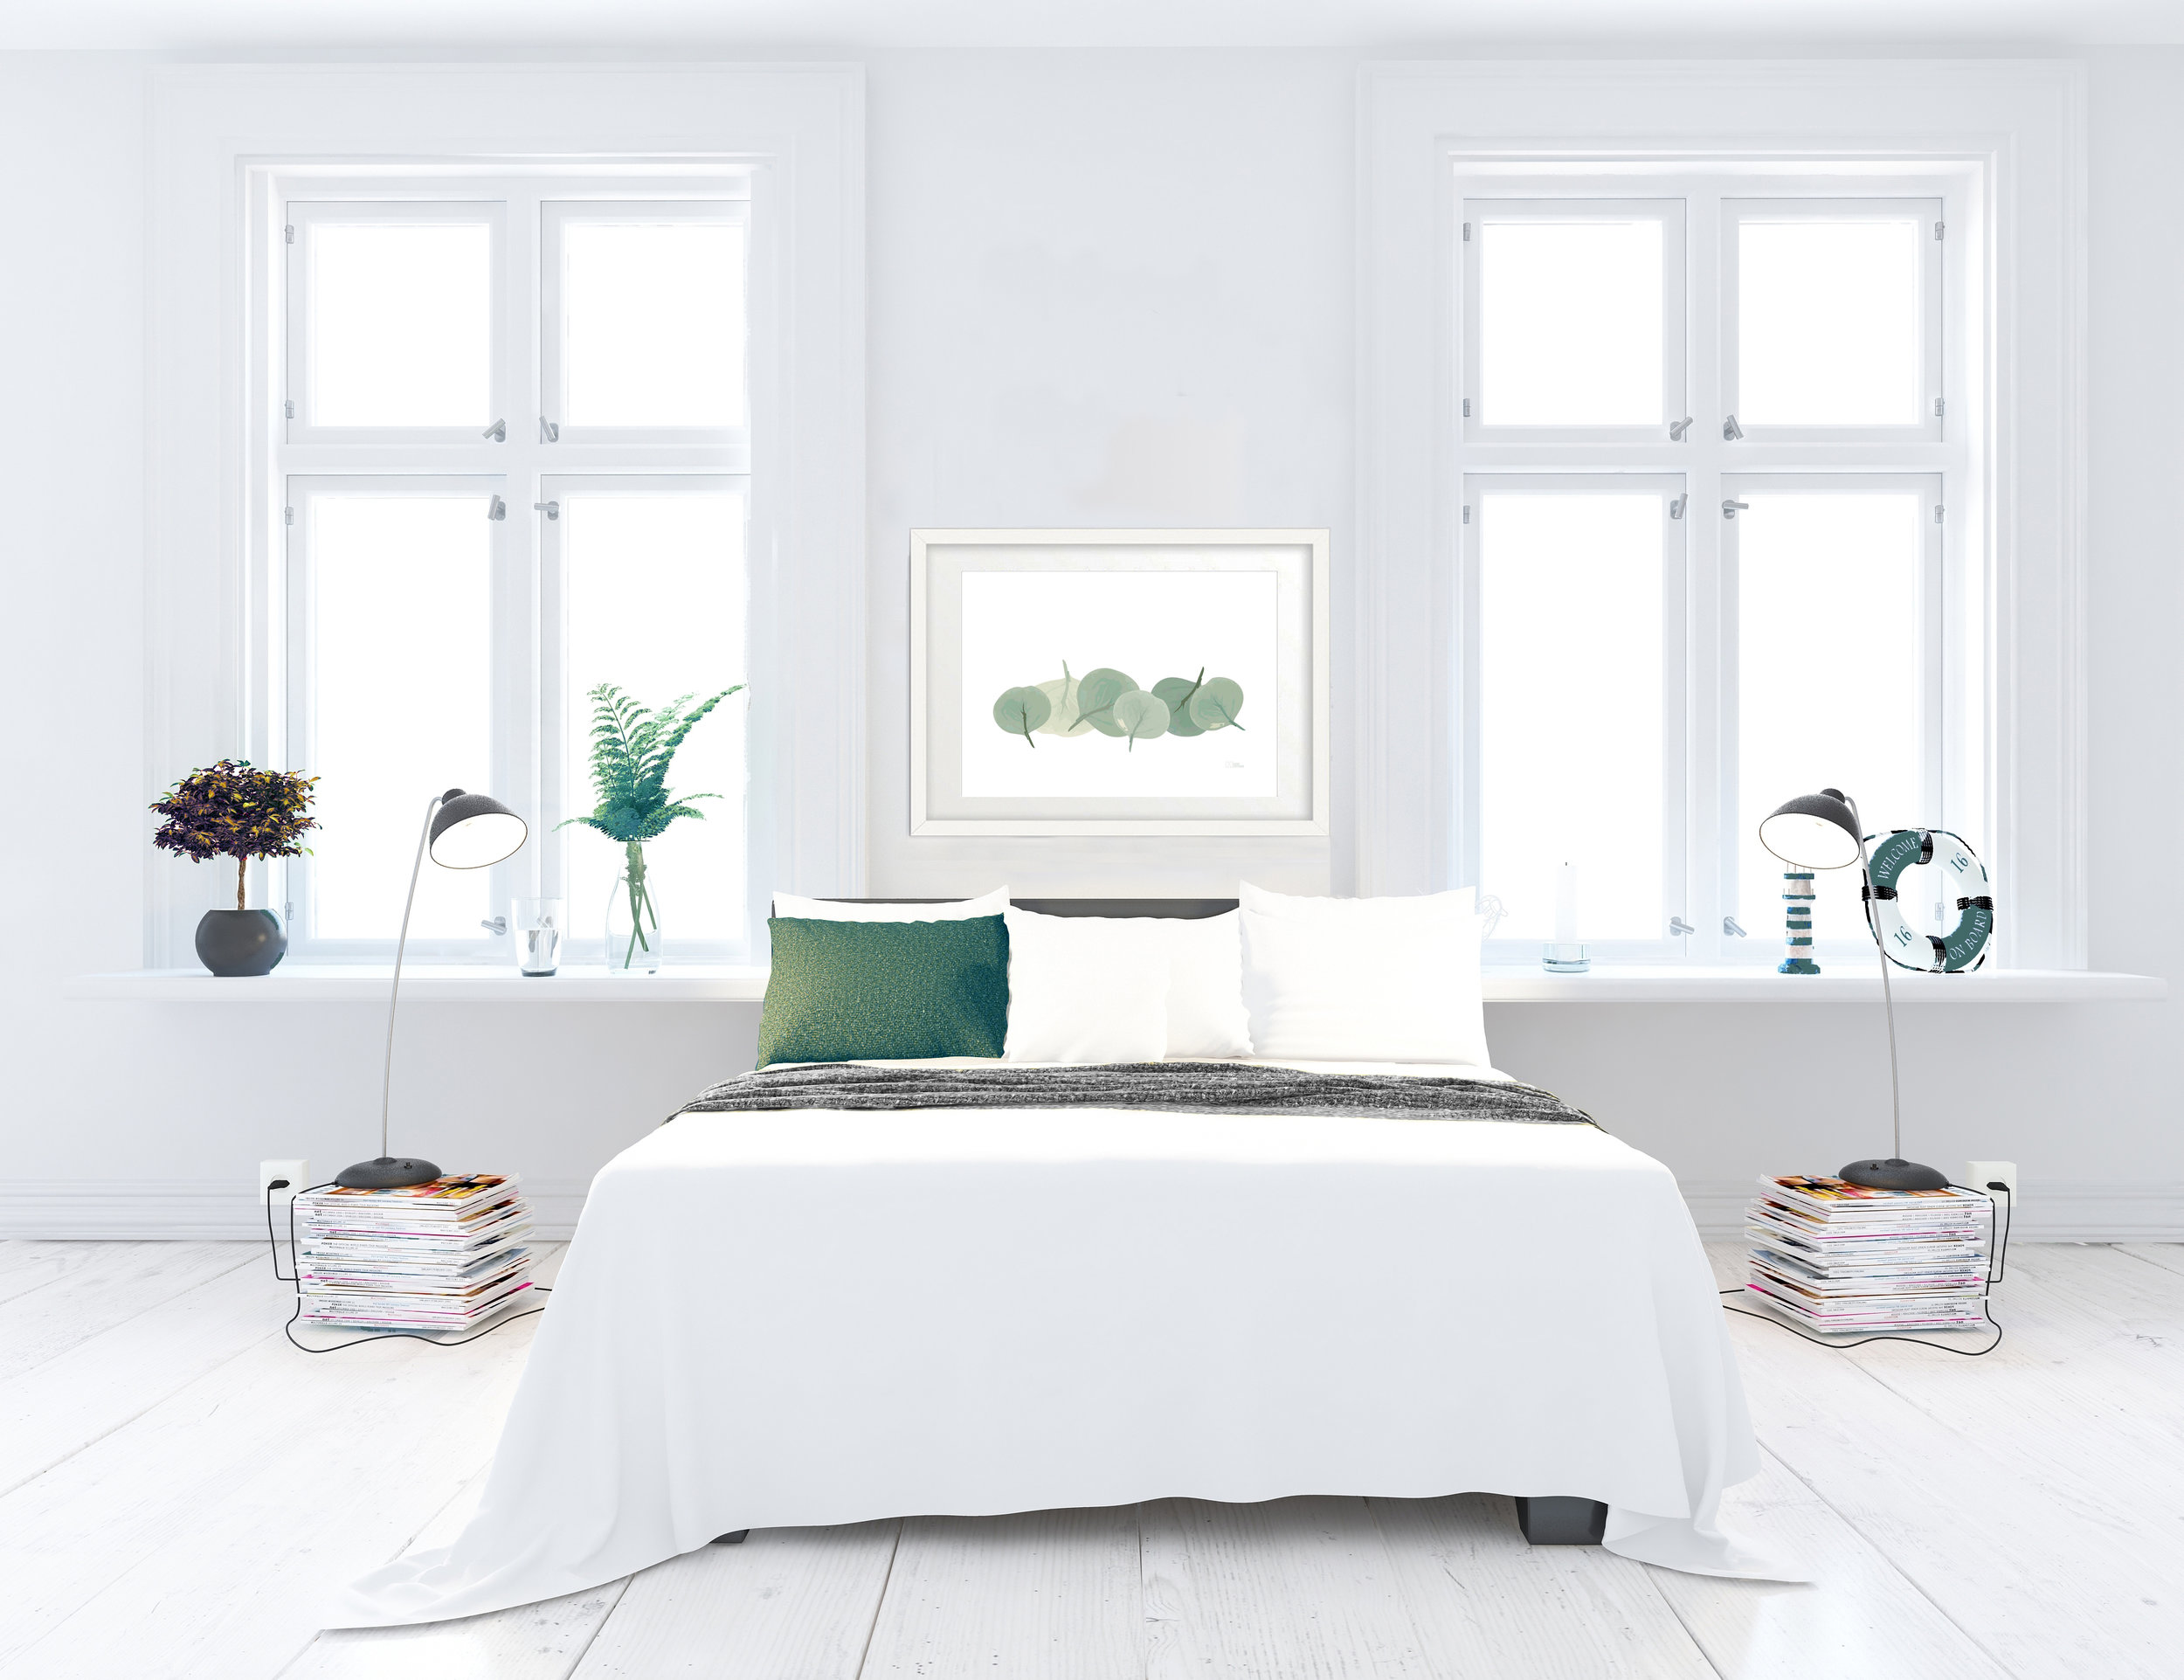 dormitorio hoja verde 4.jpg